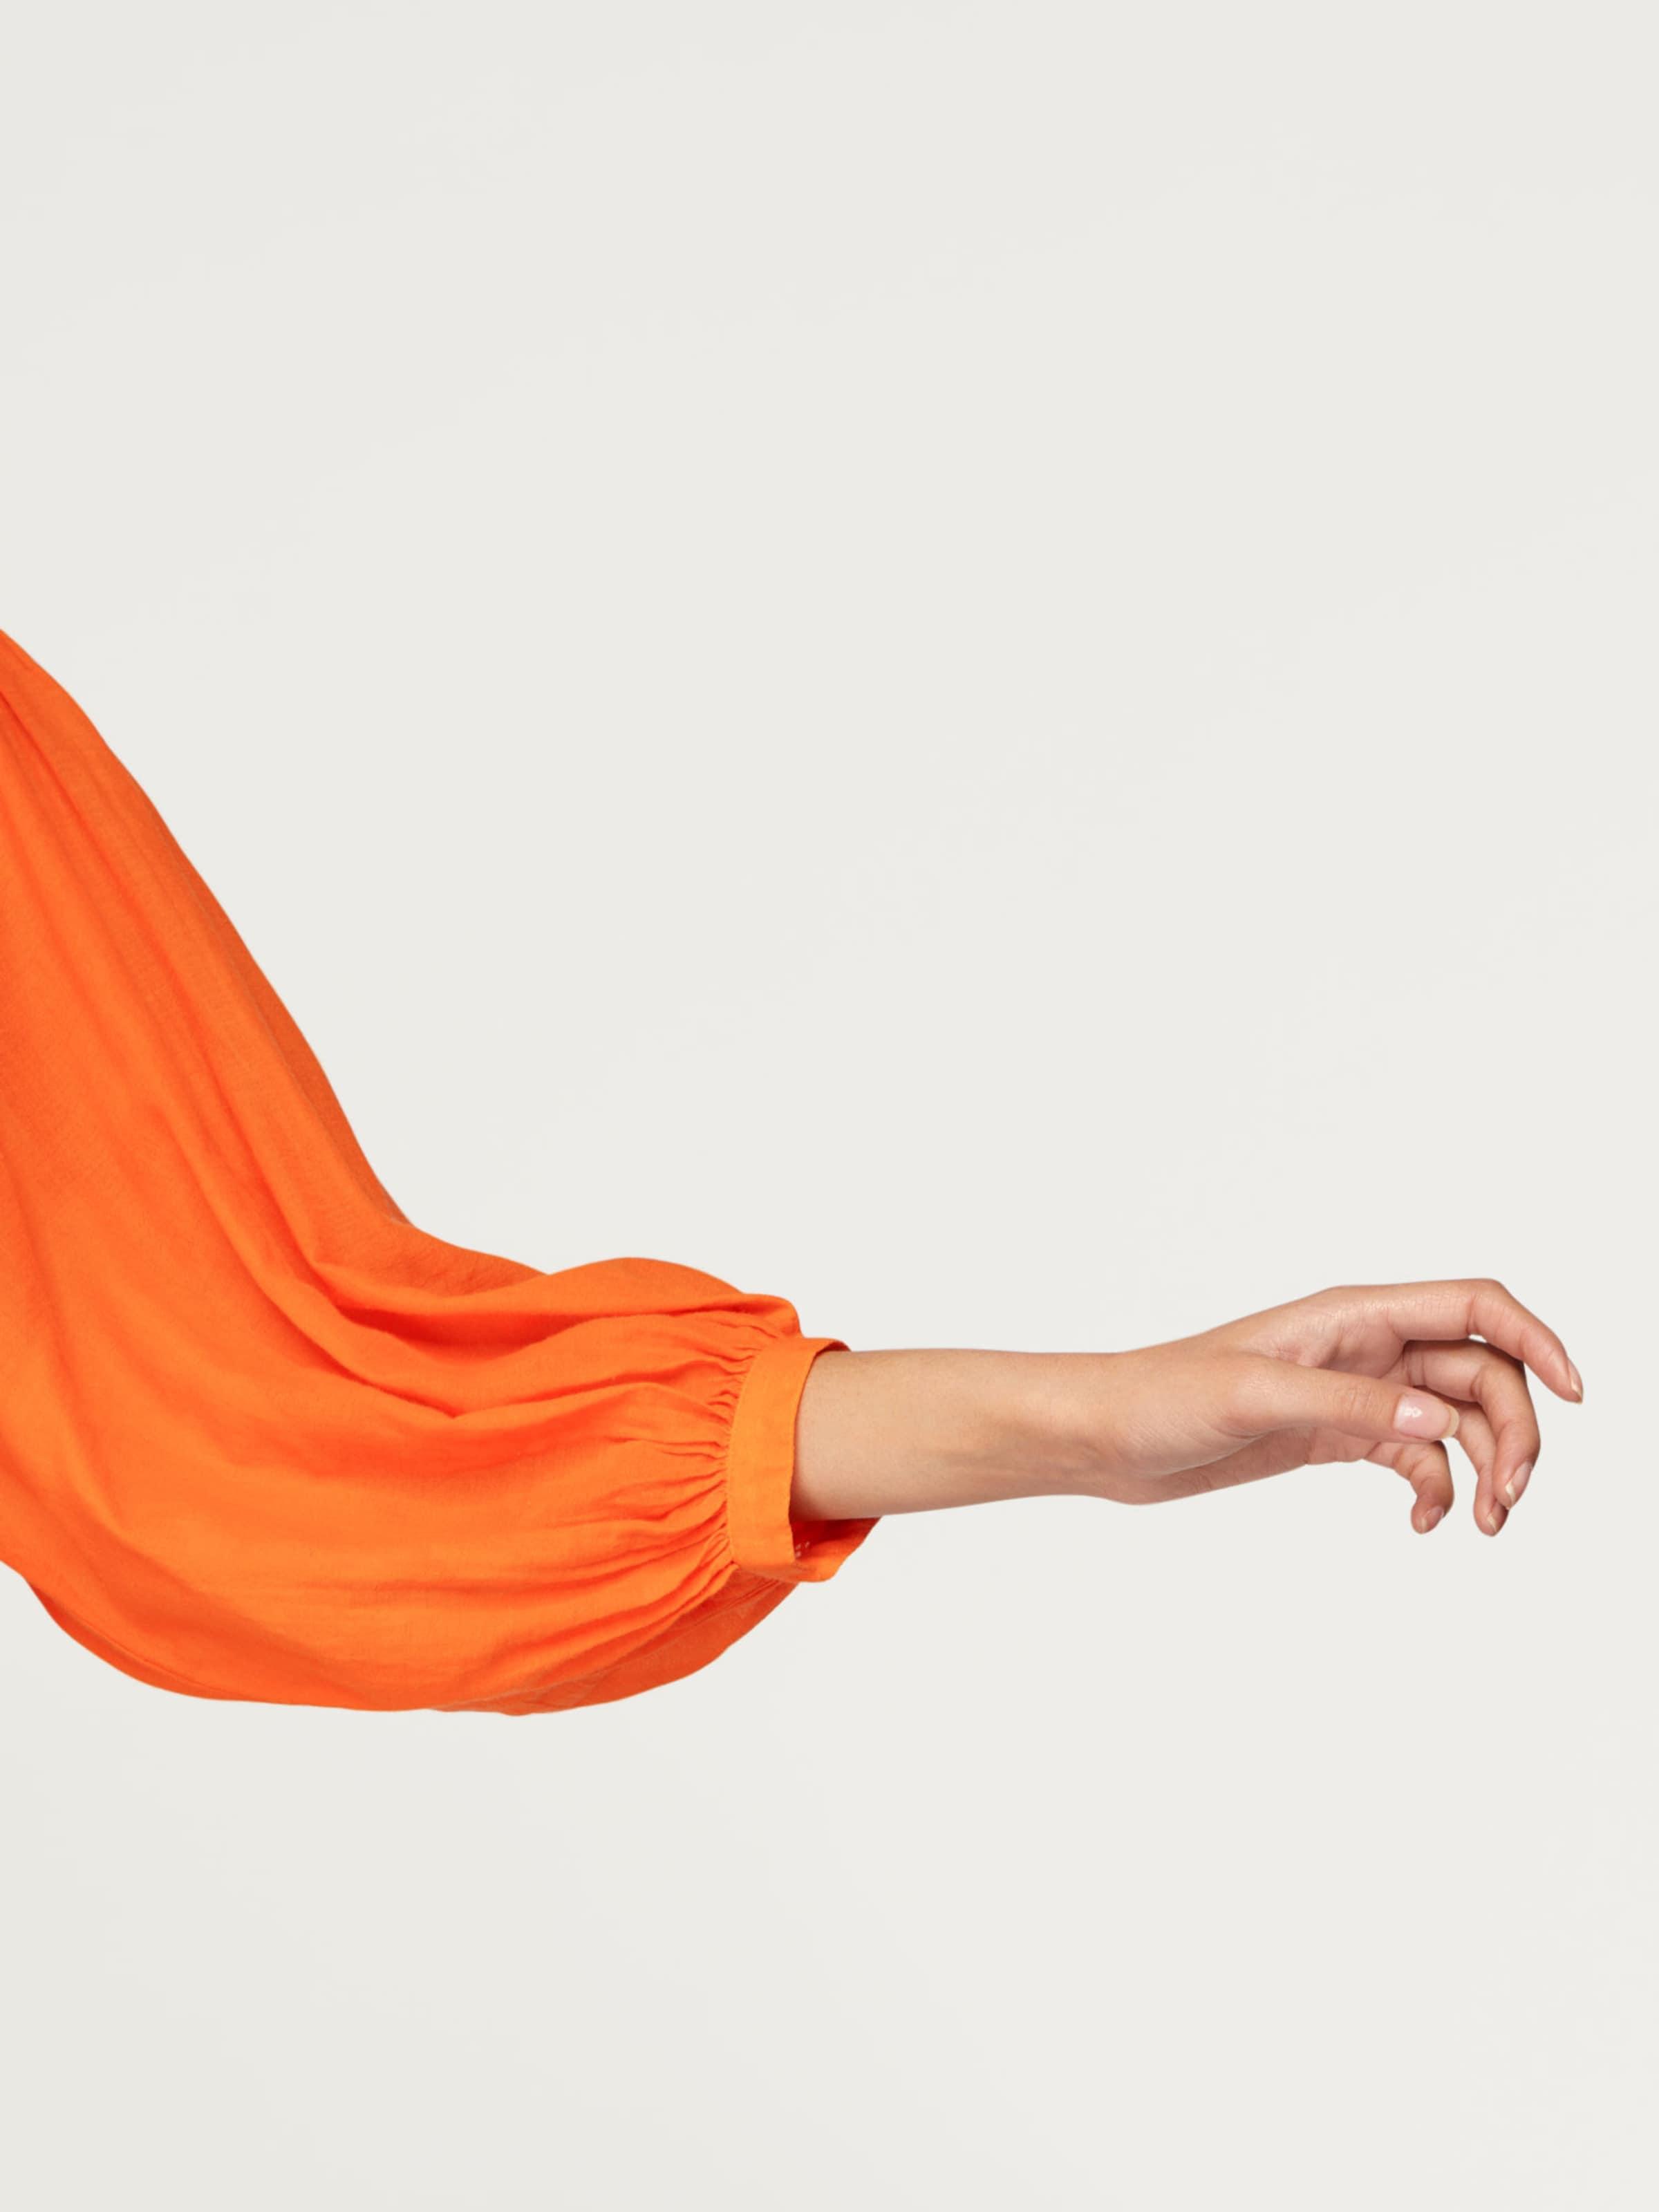 Orange Kleid In Kleid Edited 'neele' Edited 'neele' In Edited Orange Ig76vYbfy